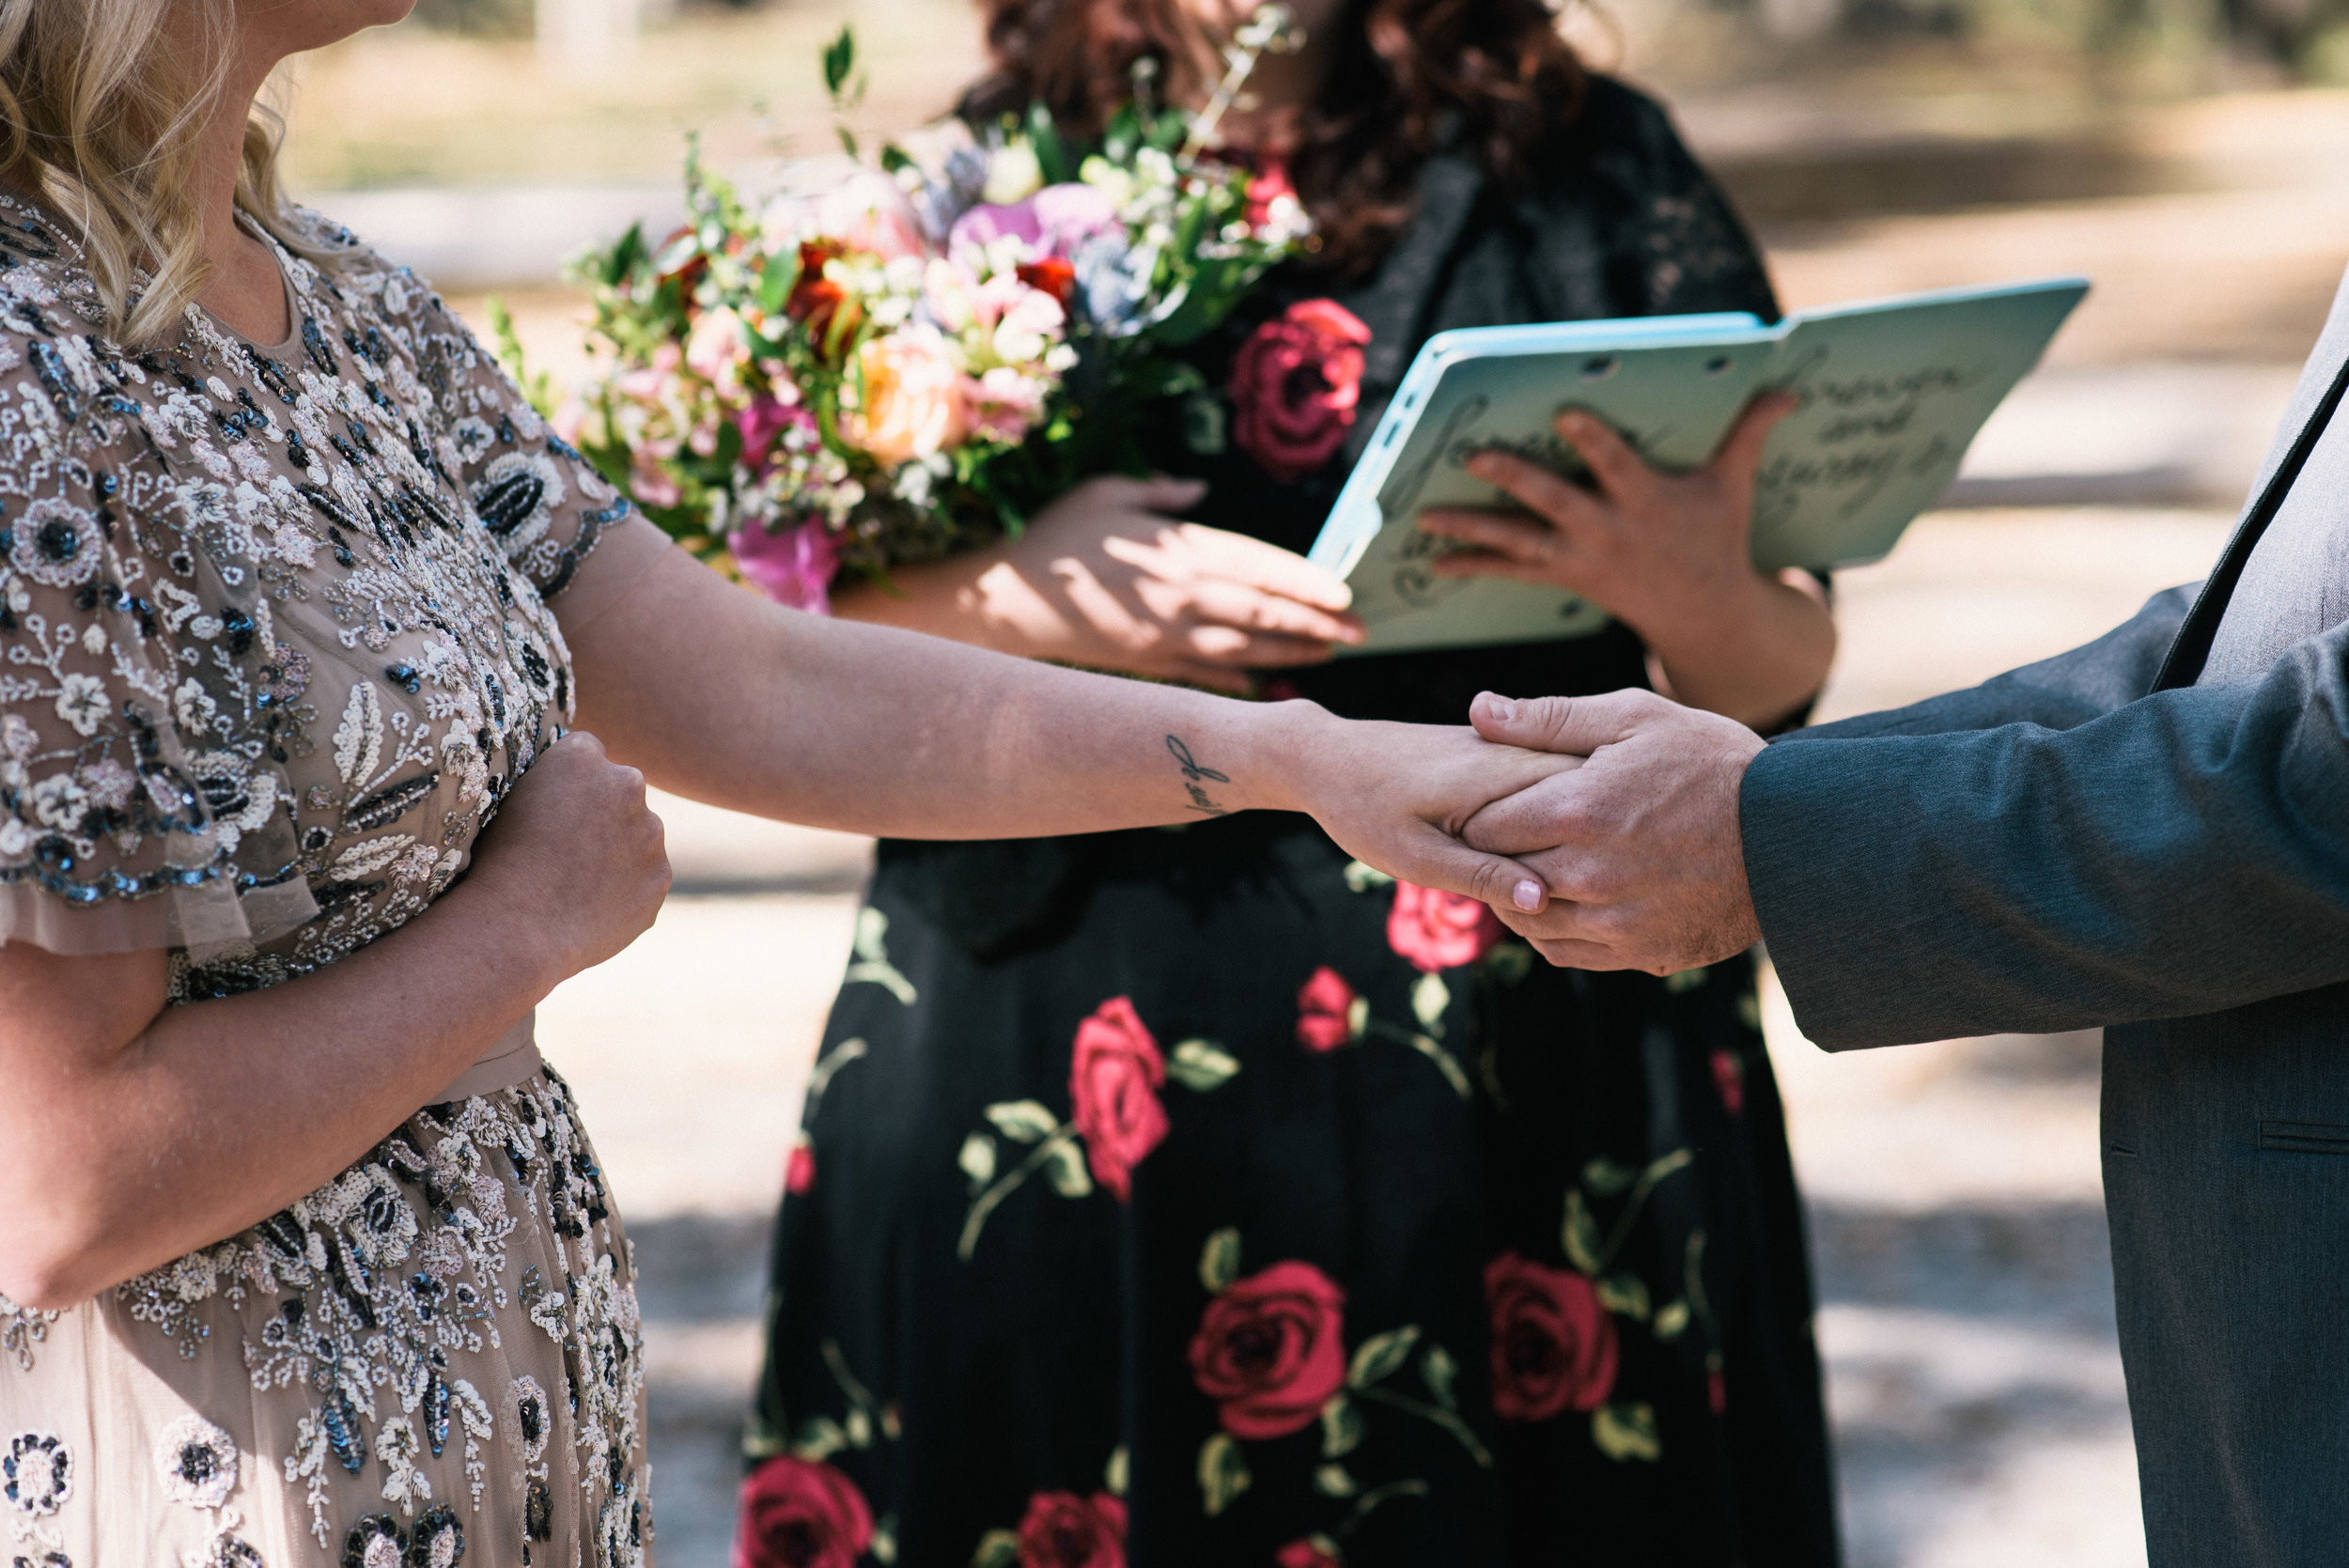 savannah-elopement-photographer-east-coast-elopement-photographer-intimate-wedding-photographer-savannah-georgia